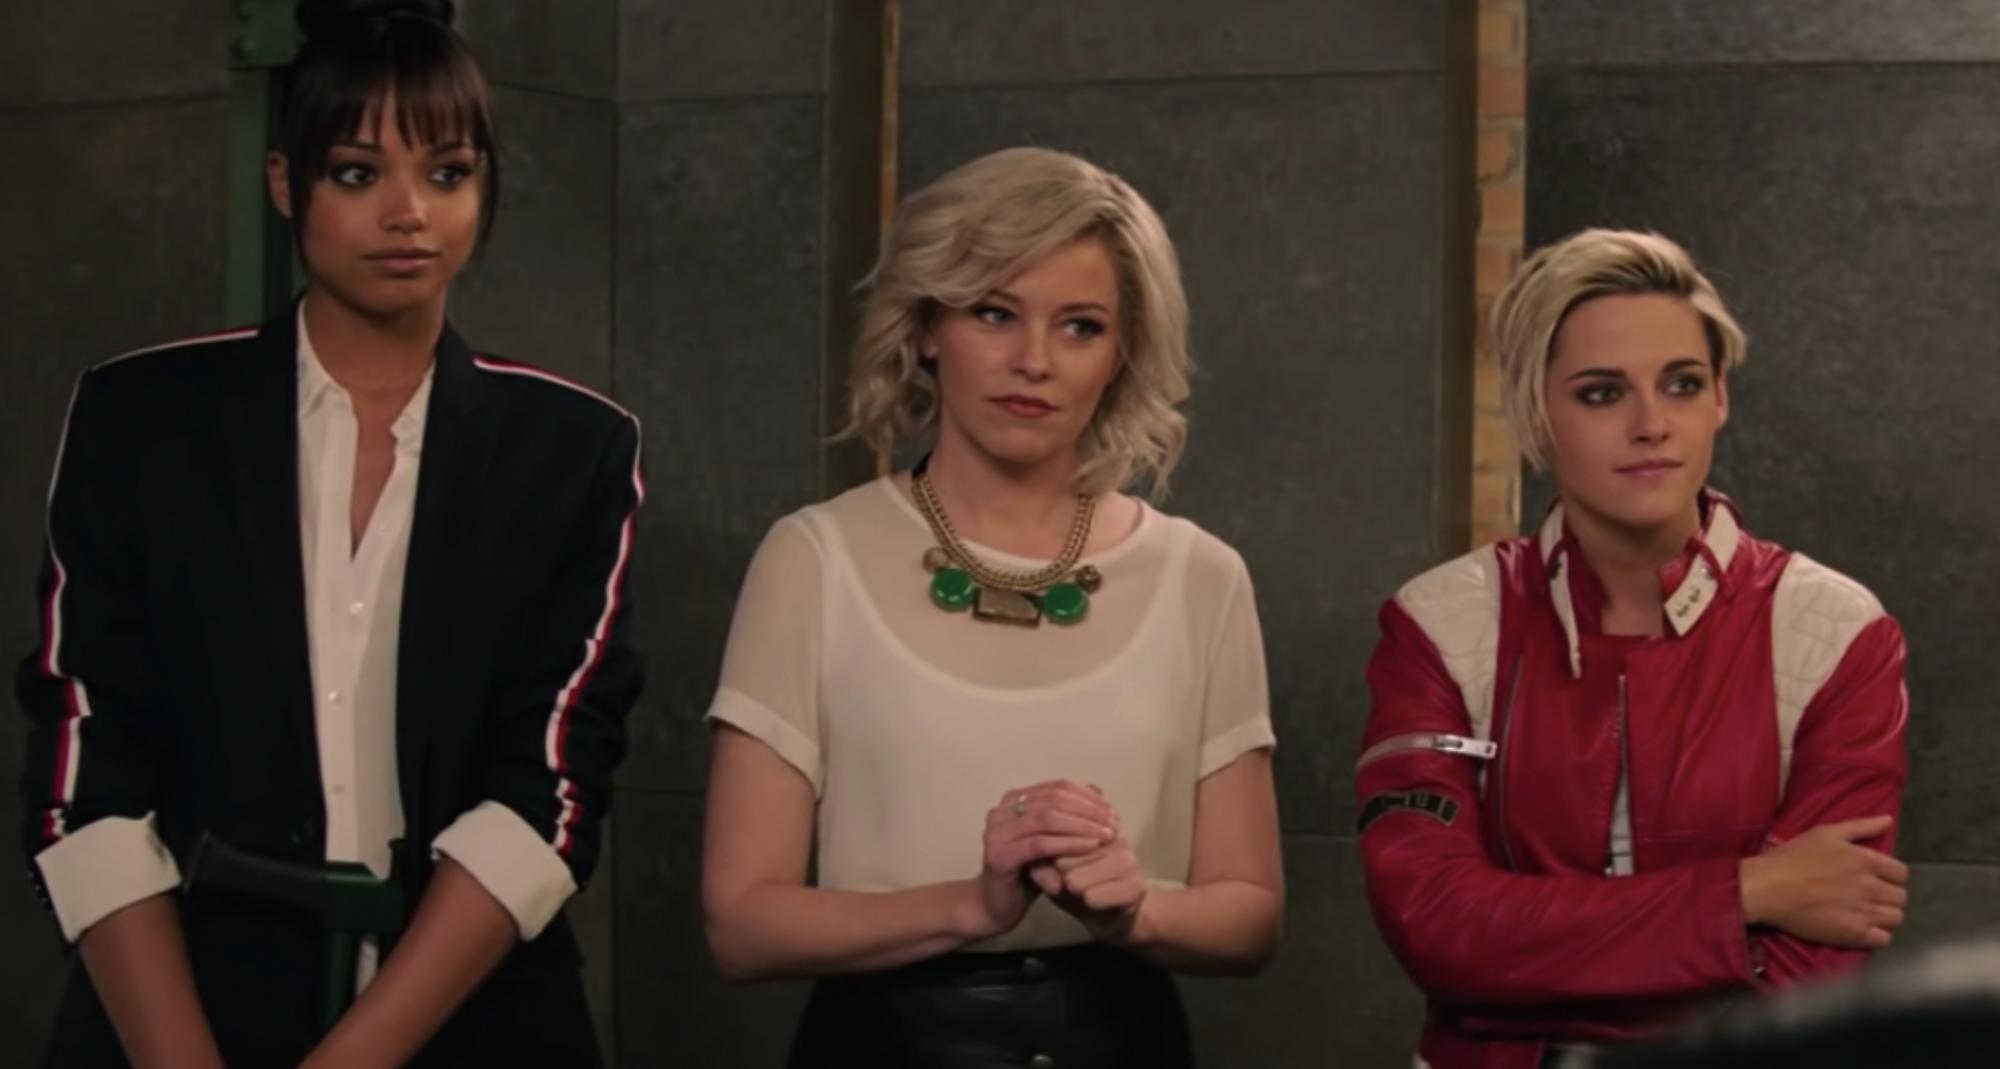 Ella Balinska as Jane Kano (left), Elizabeth Banks as Susan Bosley, and Kristen Stewart as Sabina Wilson in Charlie's Angels. All three women stand next to each other.